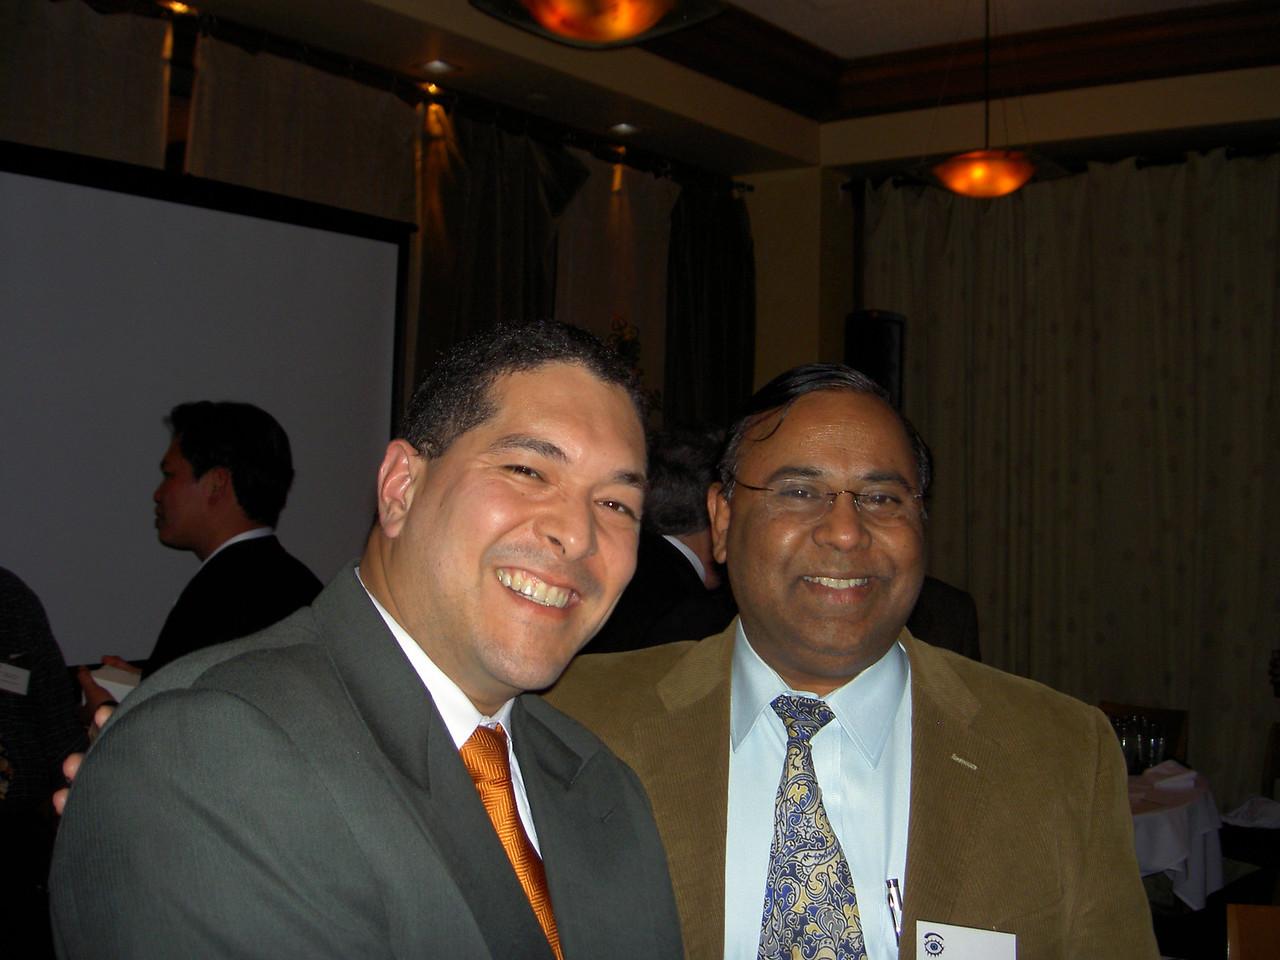 0408 Nicholas Uzcategui & Swaraj Bose